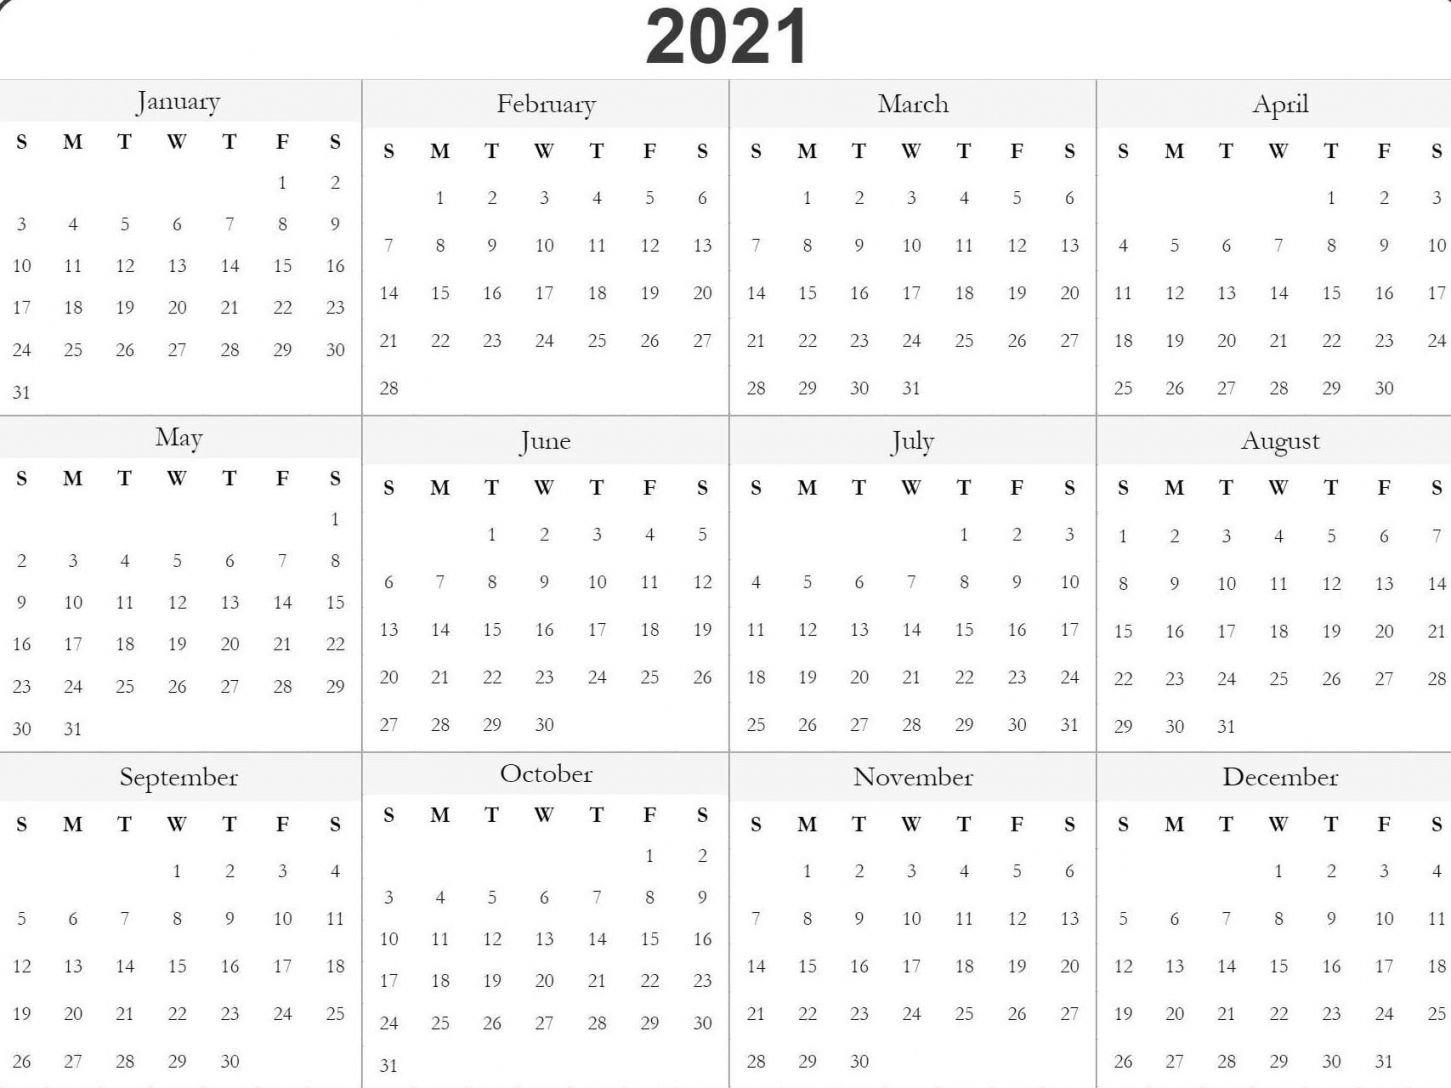 Julian Date Calendar 2021 | Example Calendar Printable in 2021 Julian Date Calendar